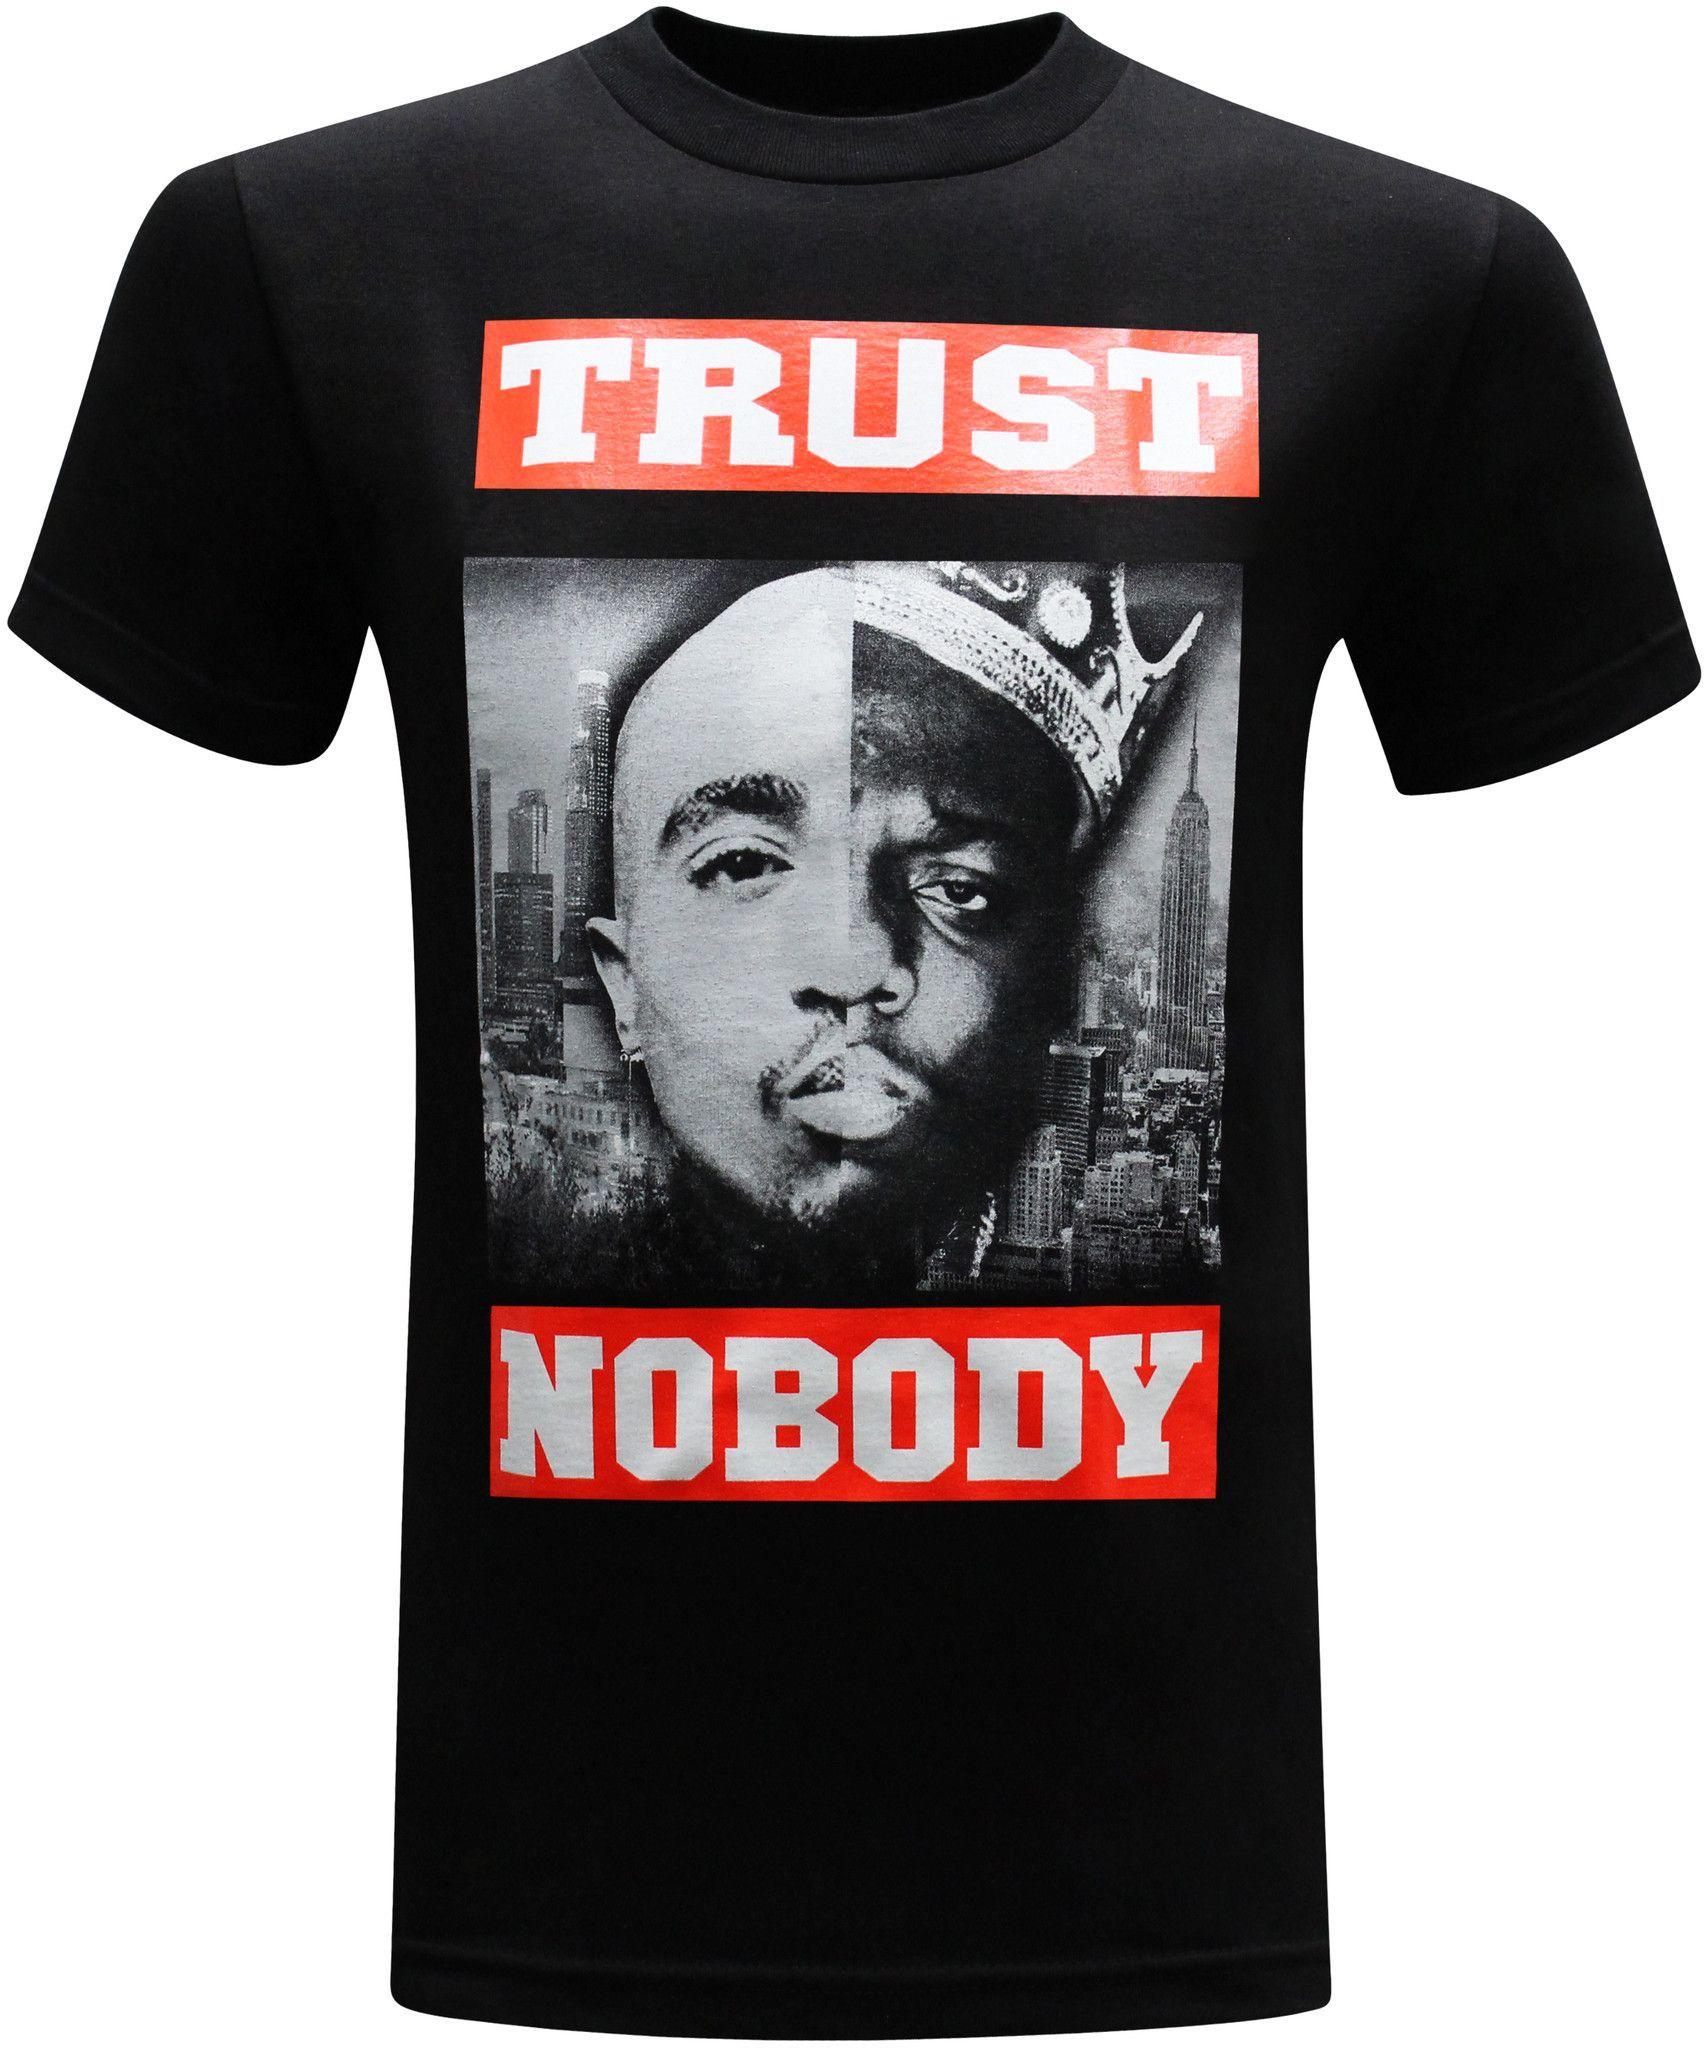 b73b577b0eb8 Trust Nobody West Coast East Coast Tupac and Biggie Men's T-Shirt ...